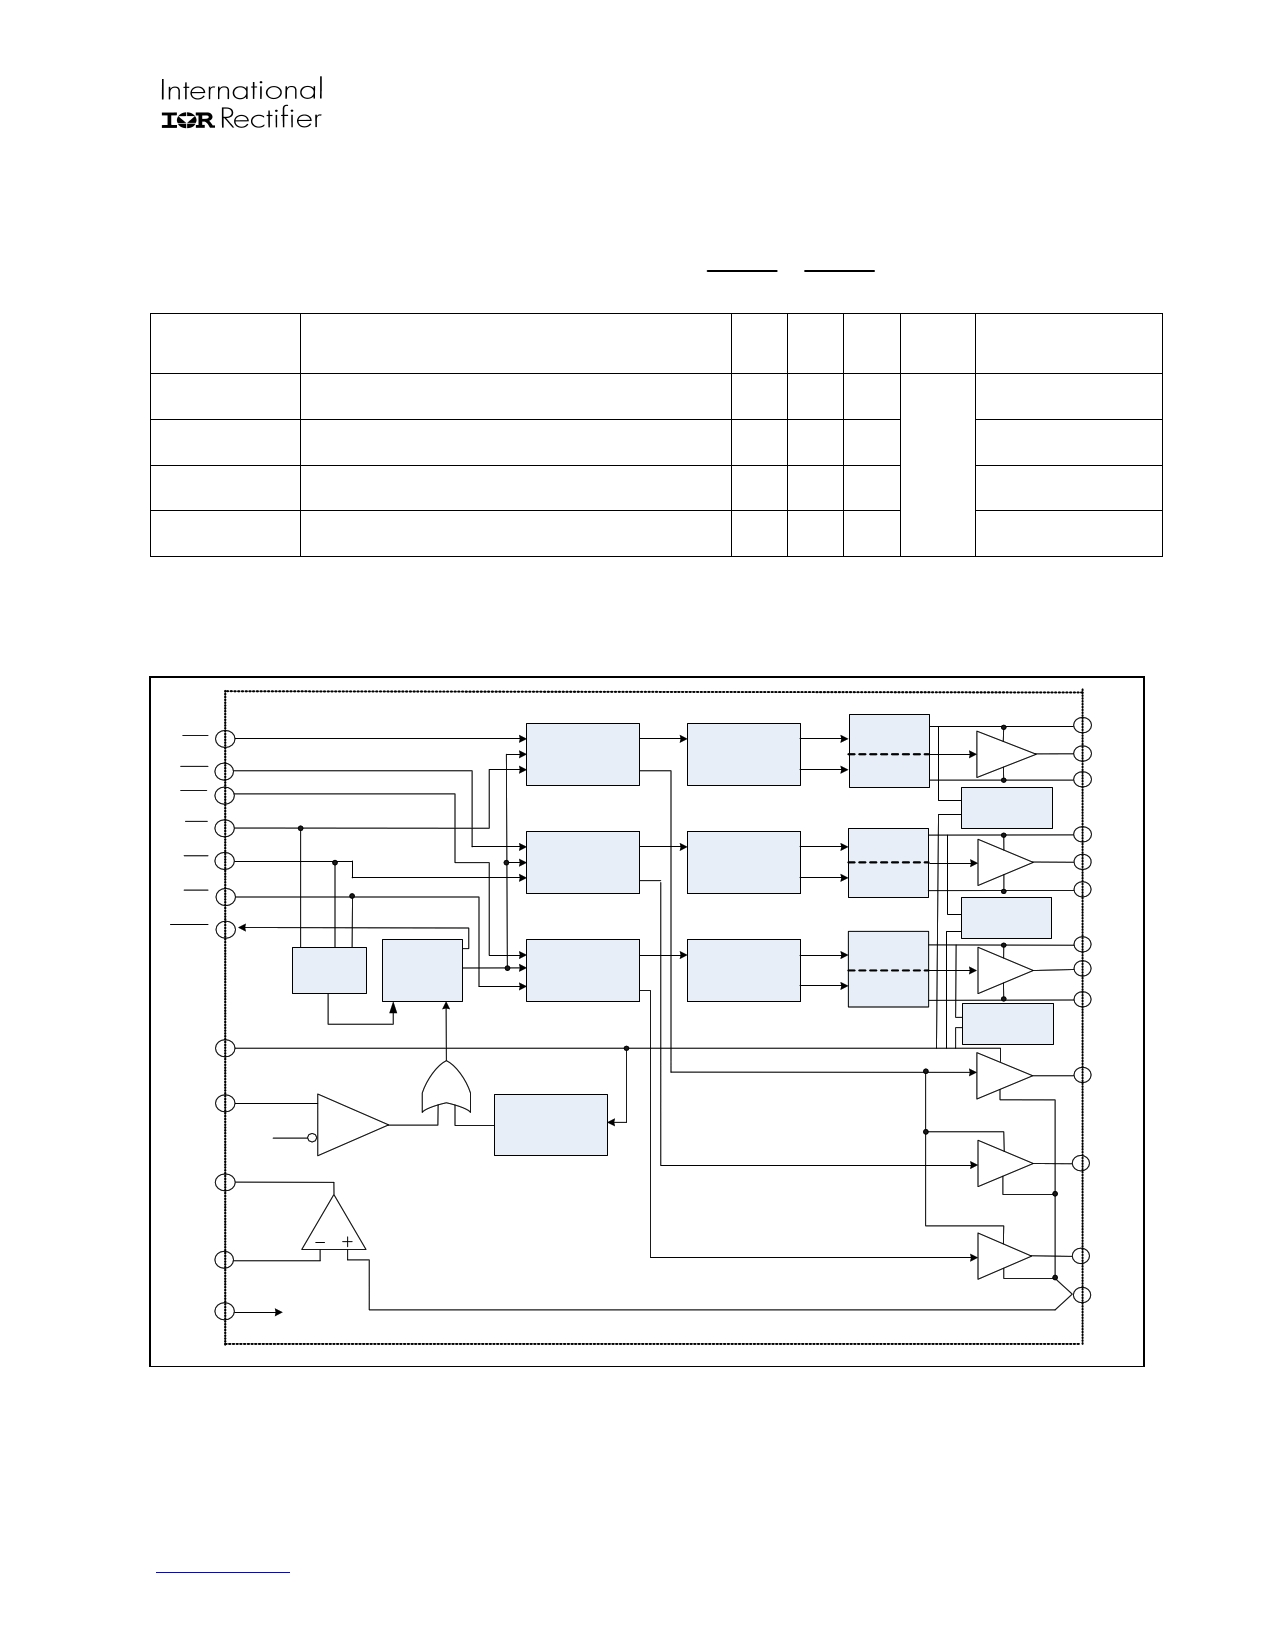 hight resolution of 240v motor wiring diagram single phase wiring diagram for single phase motor awesome datasheet irs233jpbf